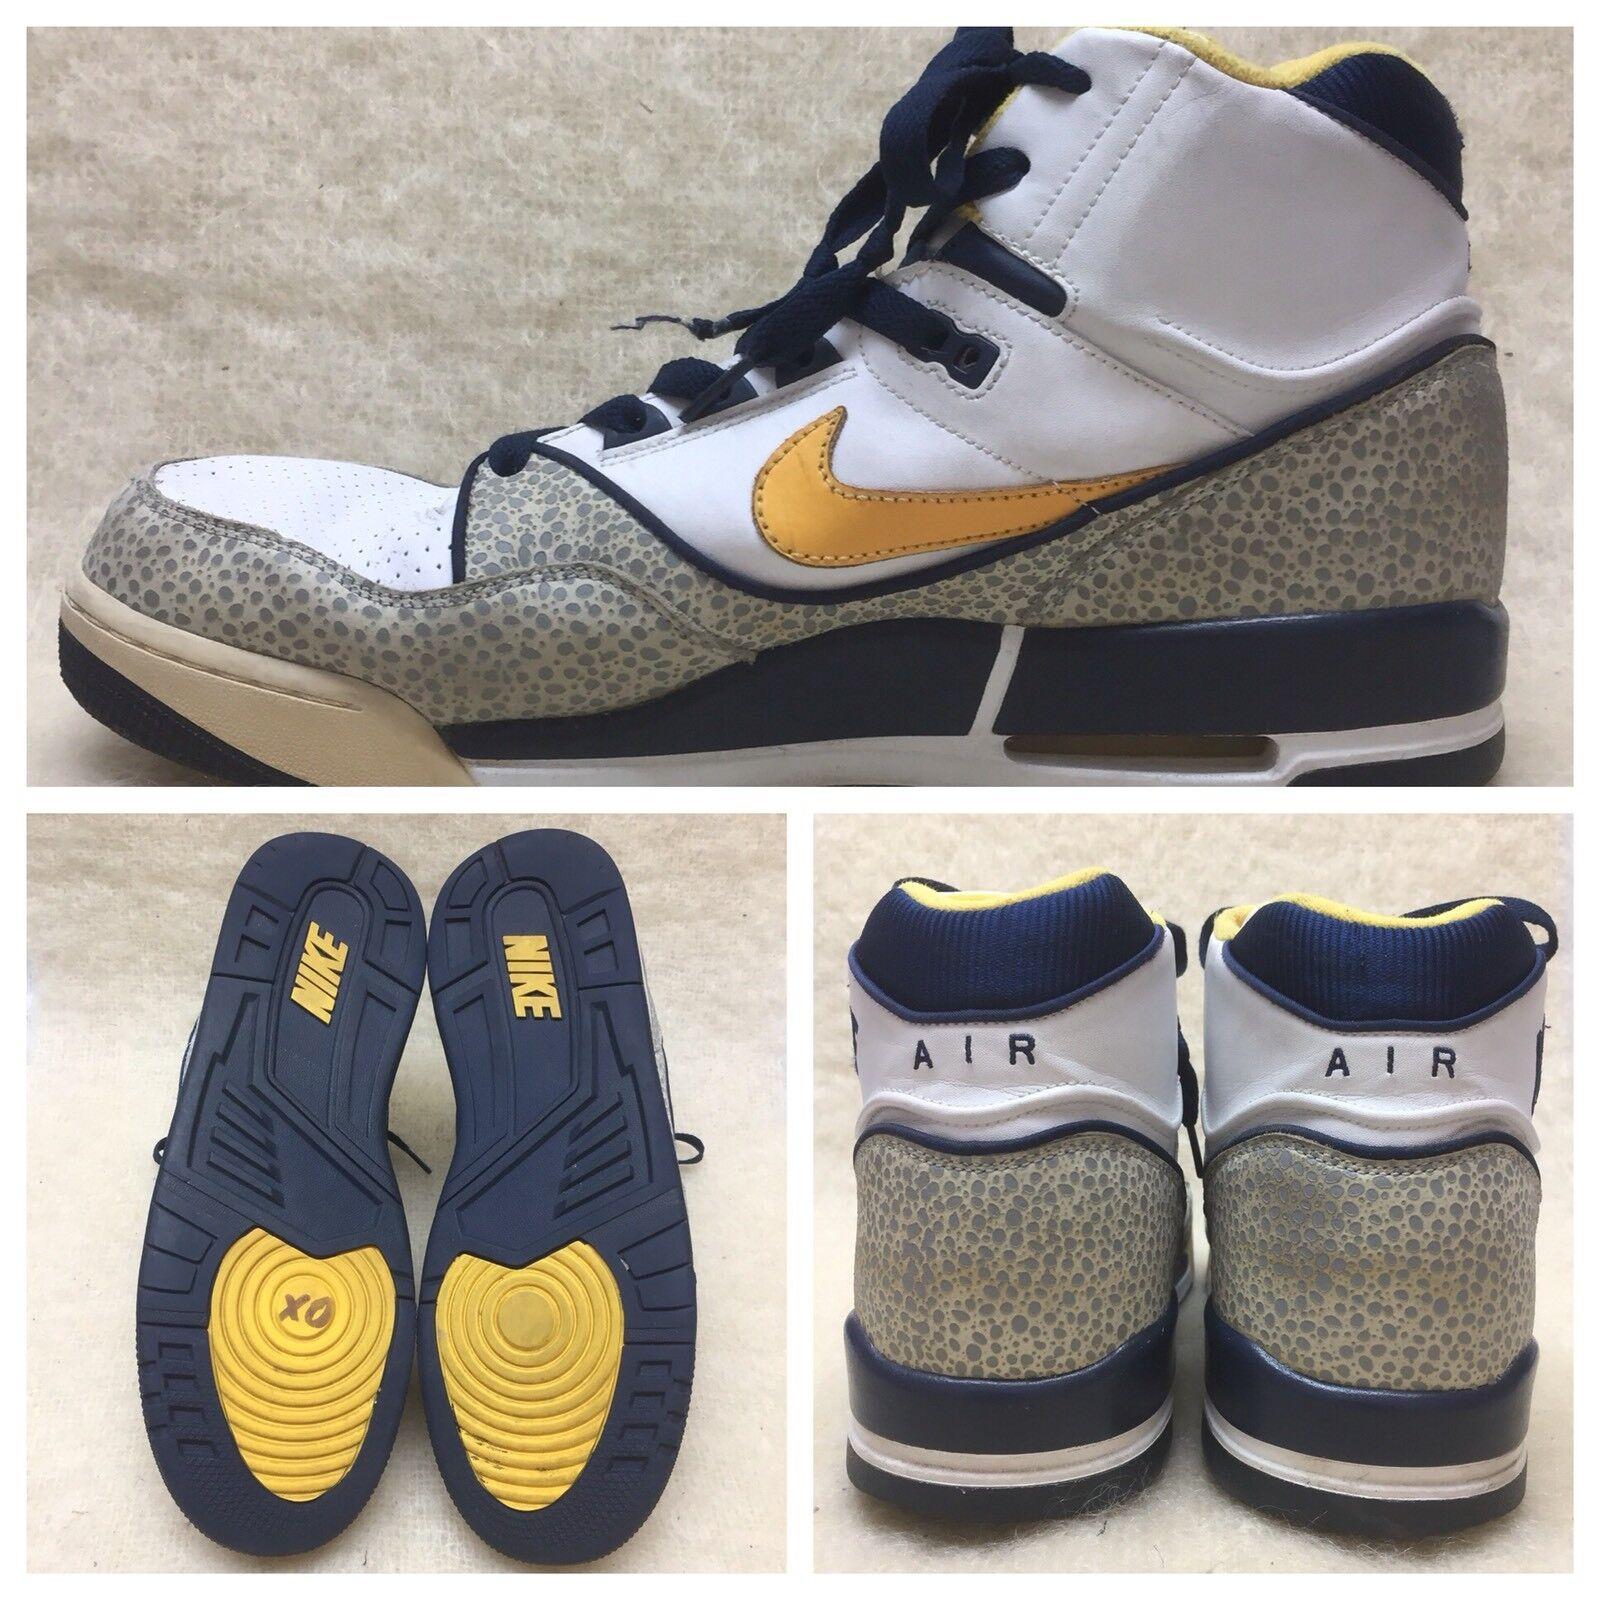 c7d513d0cb Nike Air Assault 315064-171 Safari Dunk Basketball HighTop Mens Size 13 US